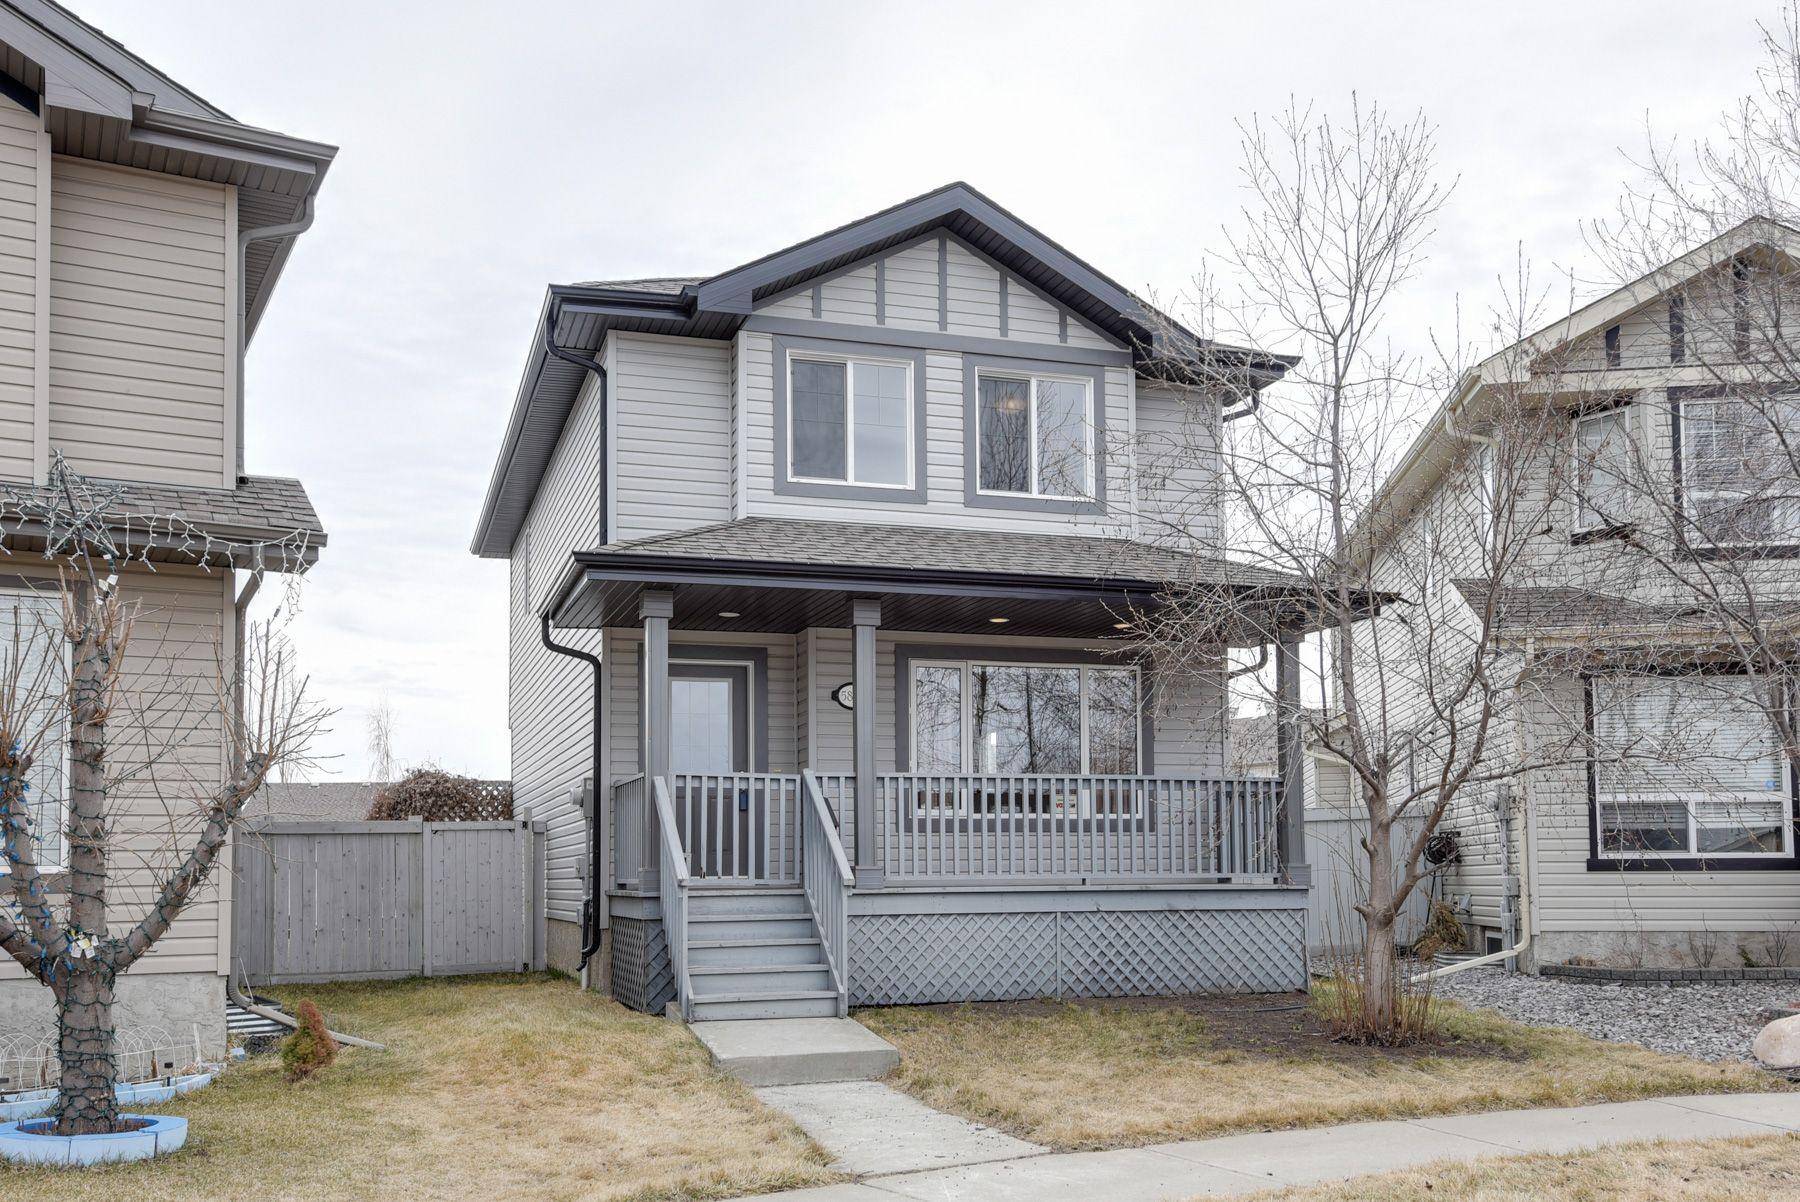 Main Photo: 5308 - 203 Street in Edmonton: Hamptons House for sale : MLS®# E4153119